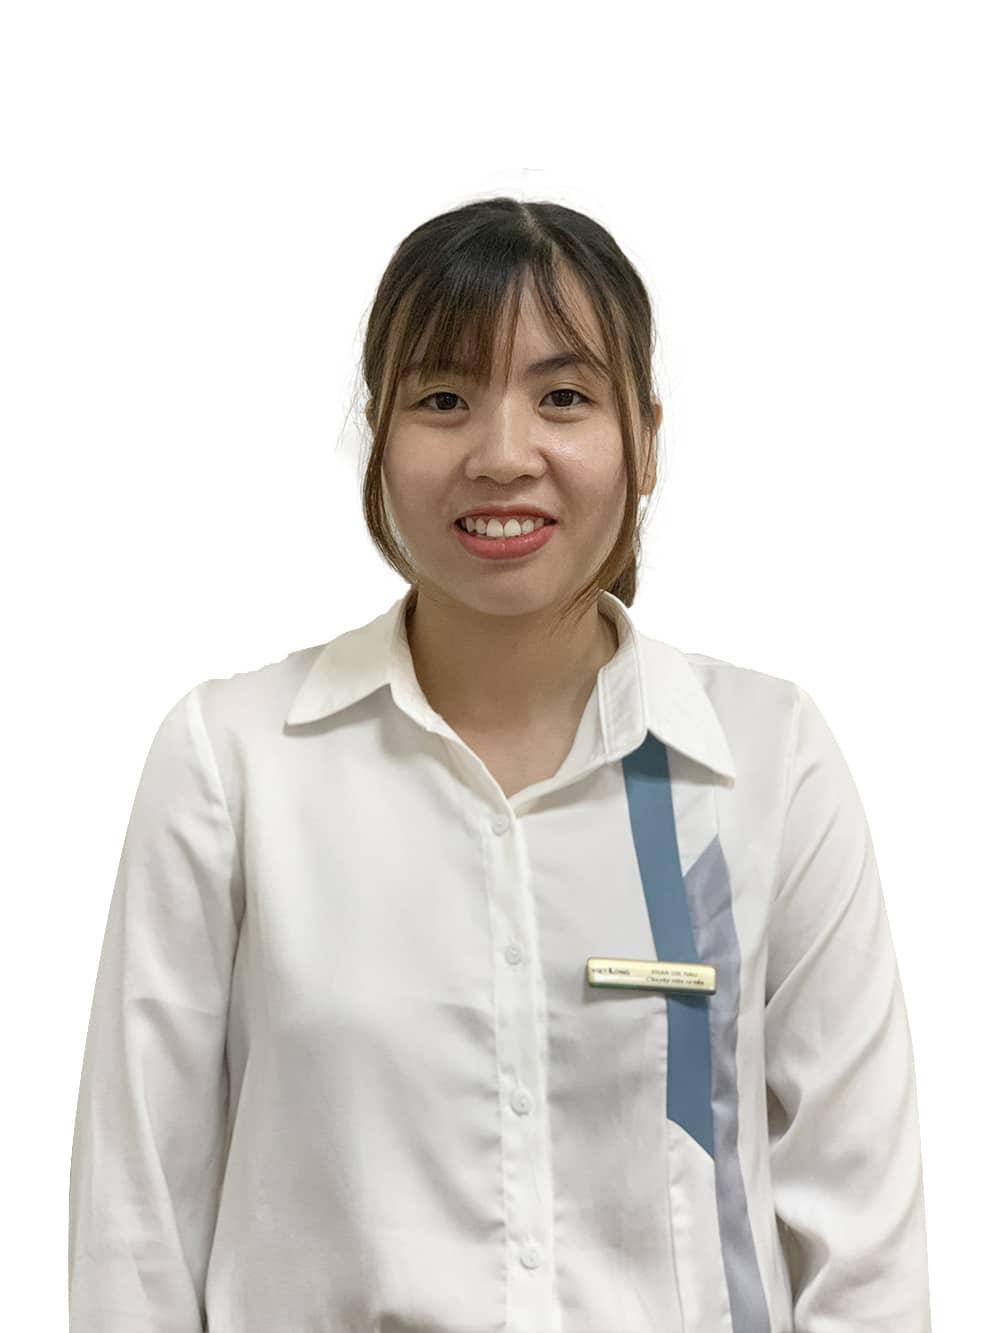 Phan Hảo